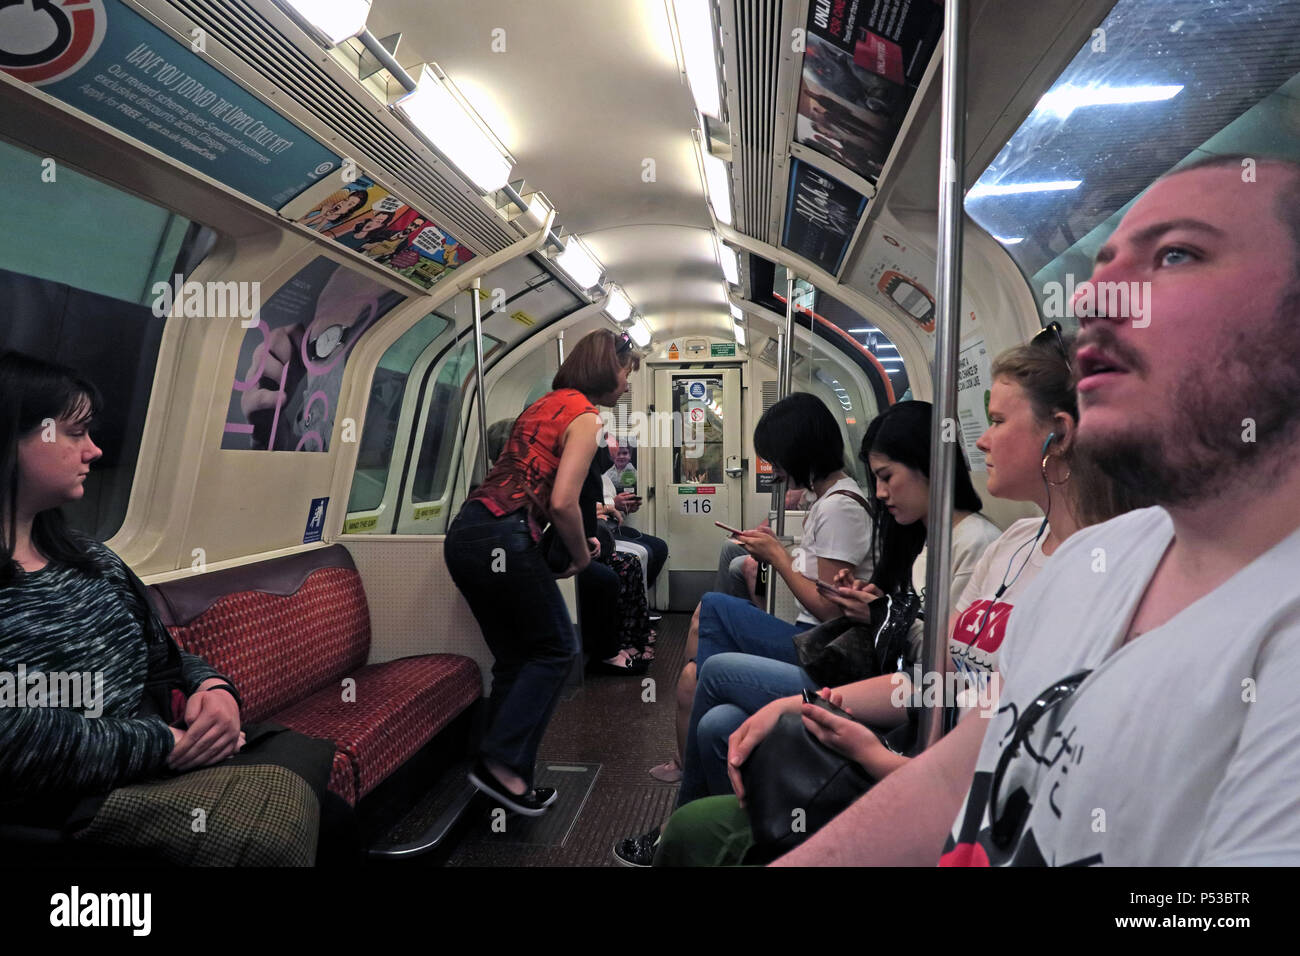 GoTonySmith,@HotpixUK,subway,railway,city